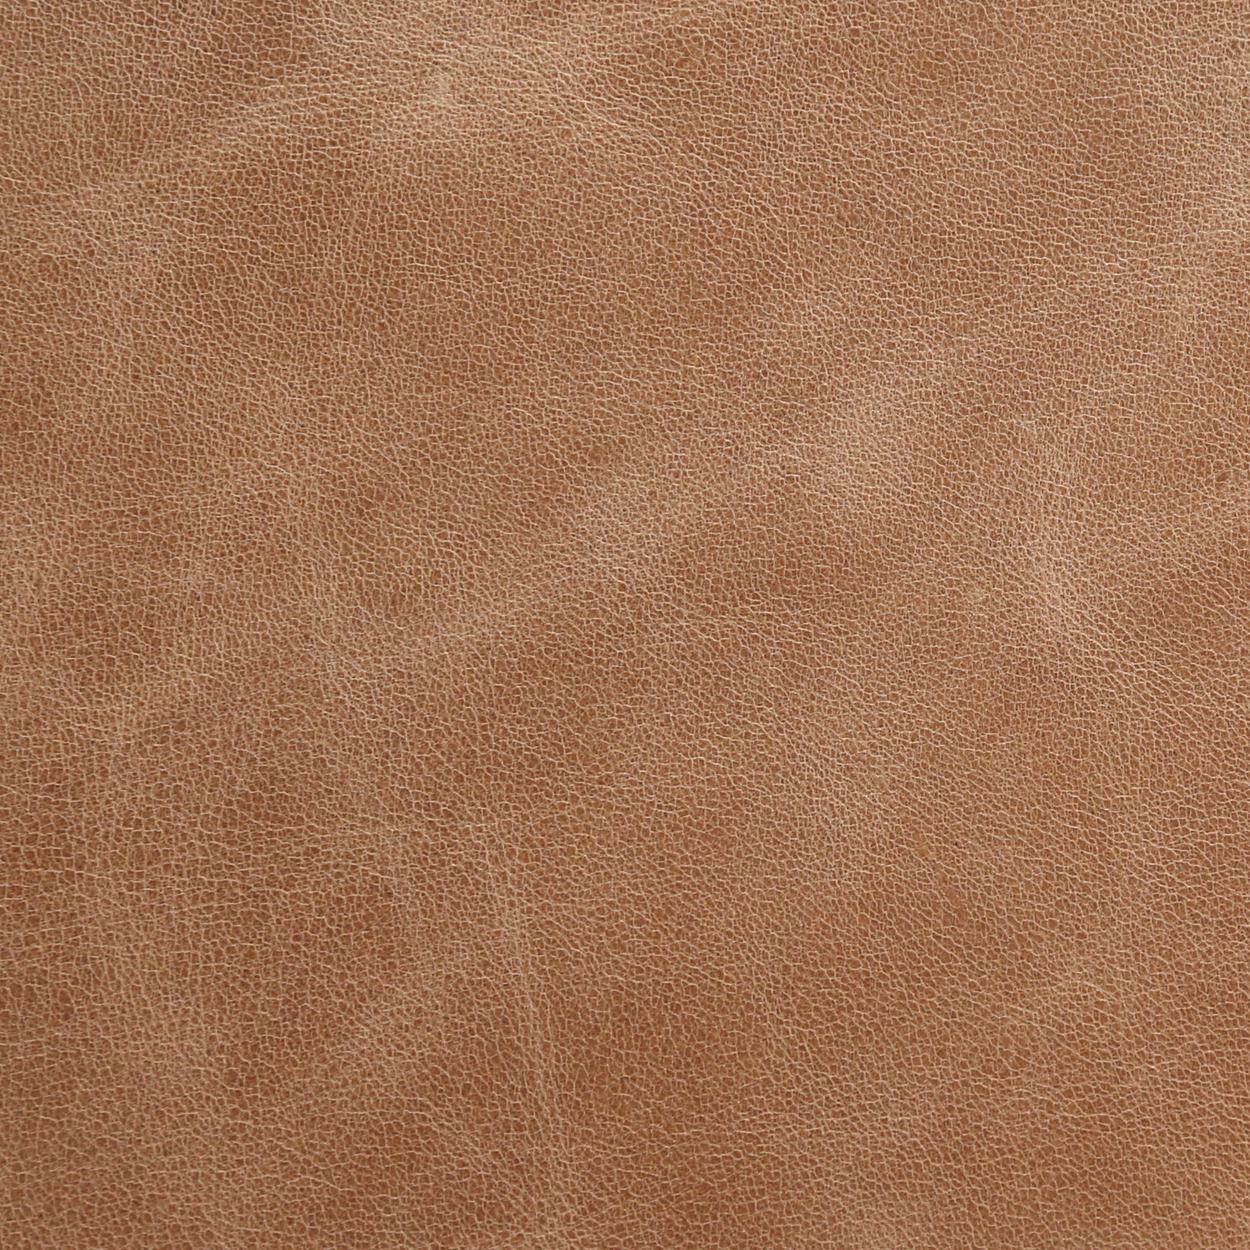 Distressed Leather - Sahara